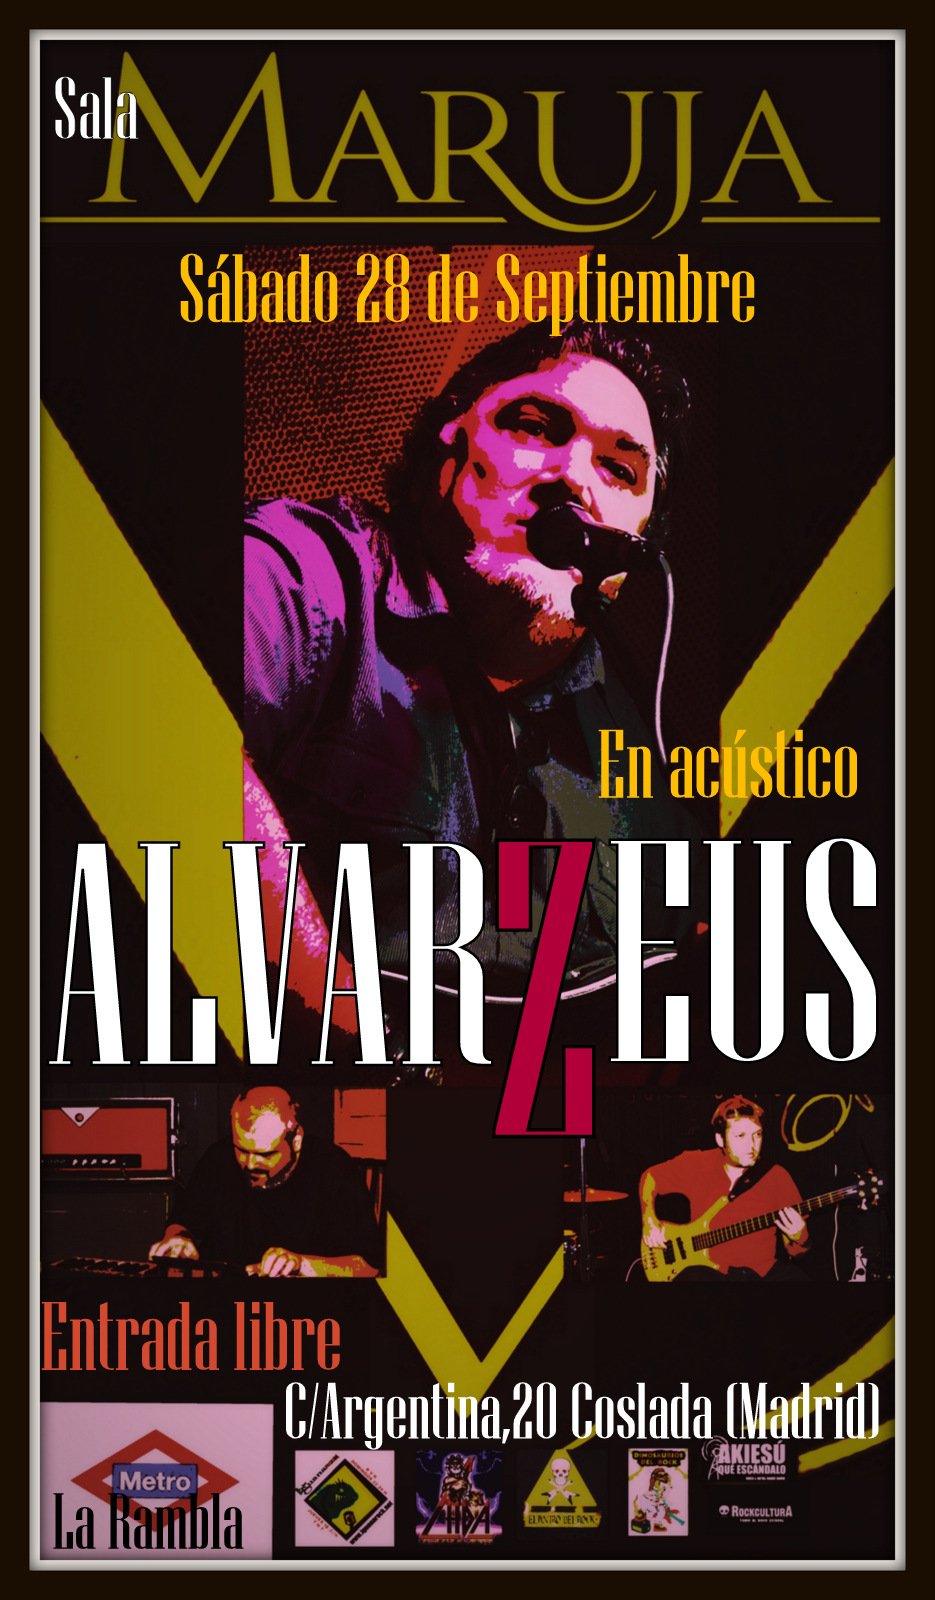 Alvarzeus (Sala Maruja 28-09-2013)